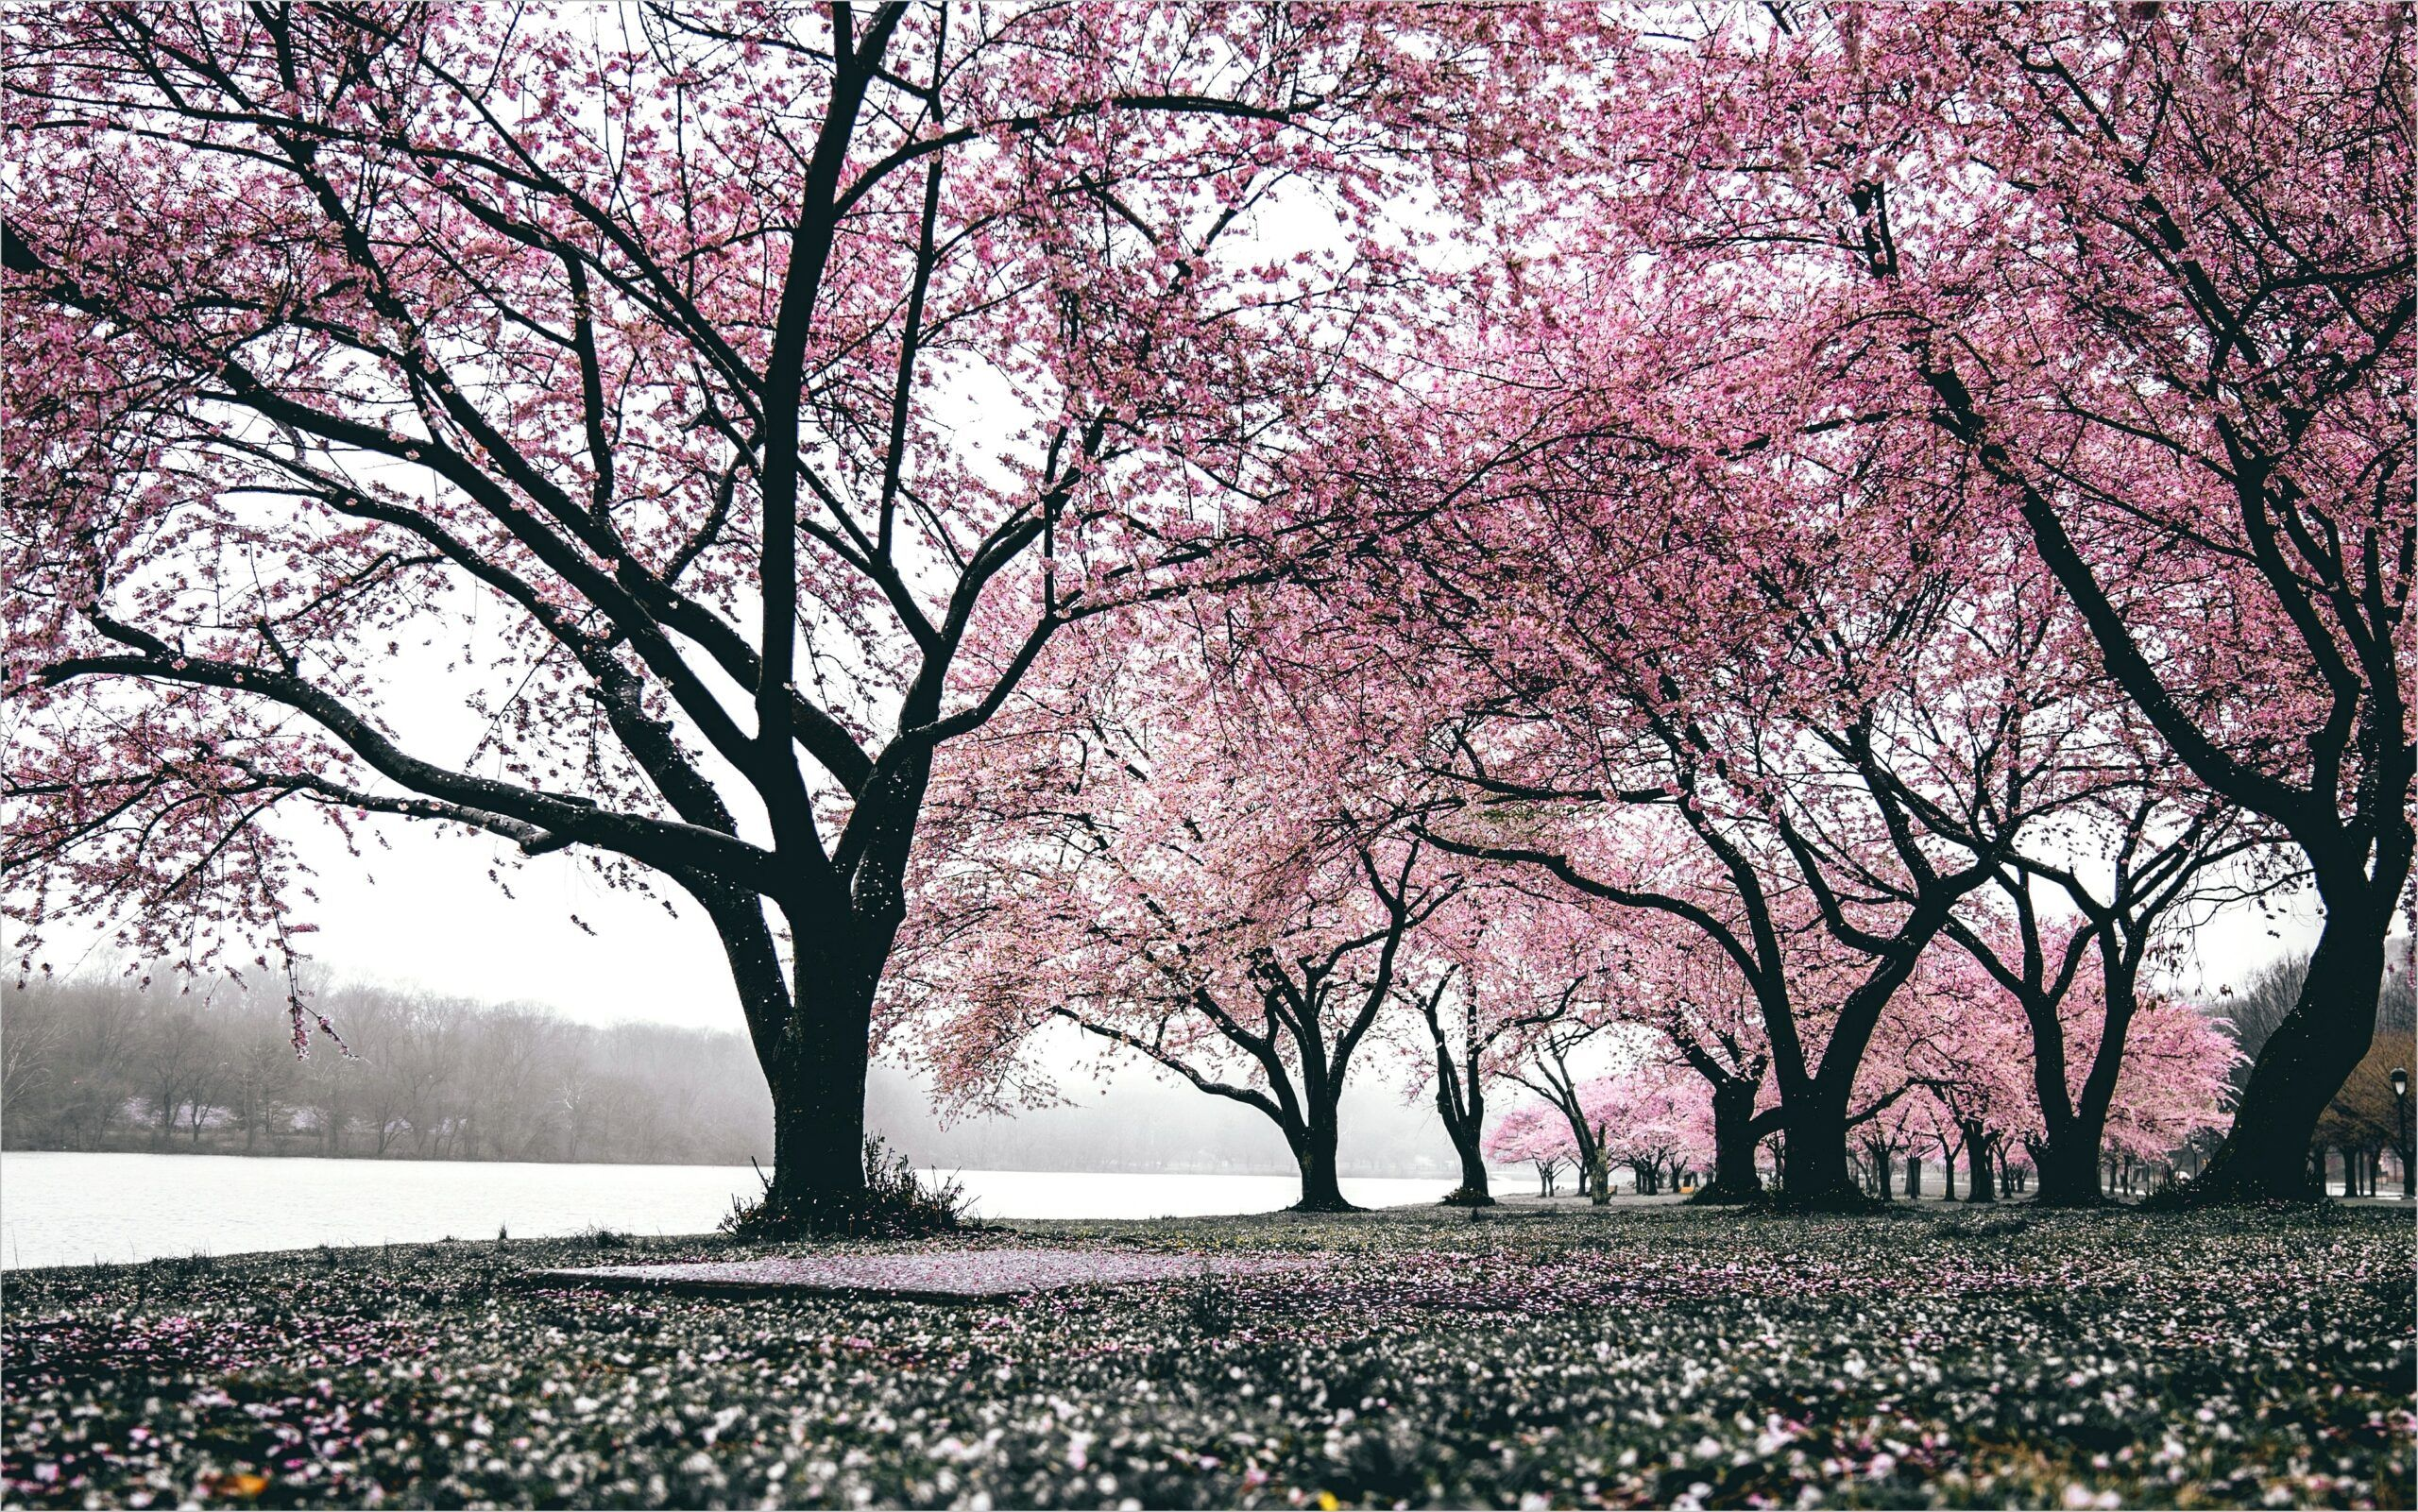 Cherry Blossom Tree Volcano Wallpaper 4k In 2020 Volcano Wallpaper Cherry Blossom Wallpaper Blossom Trees